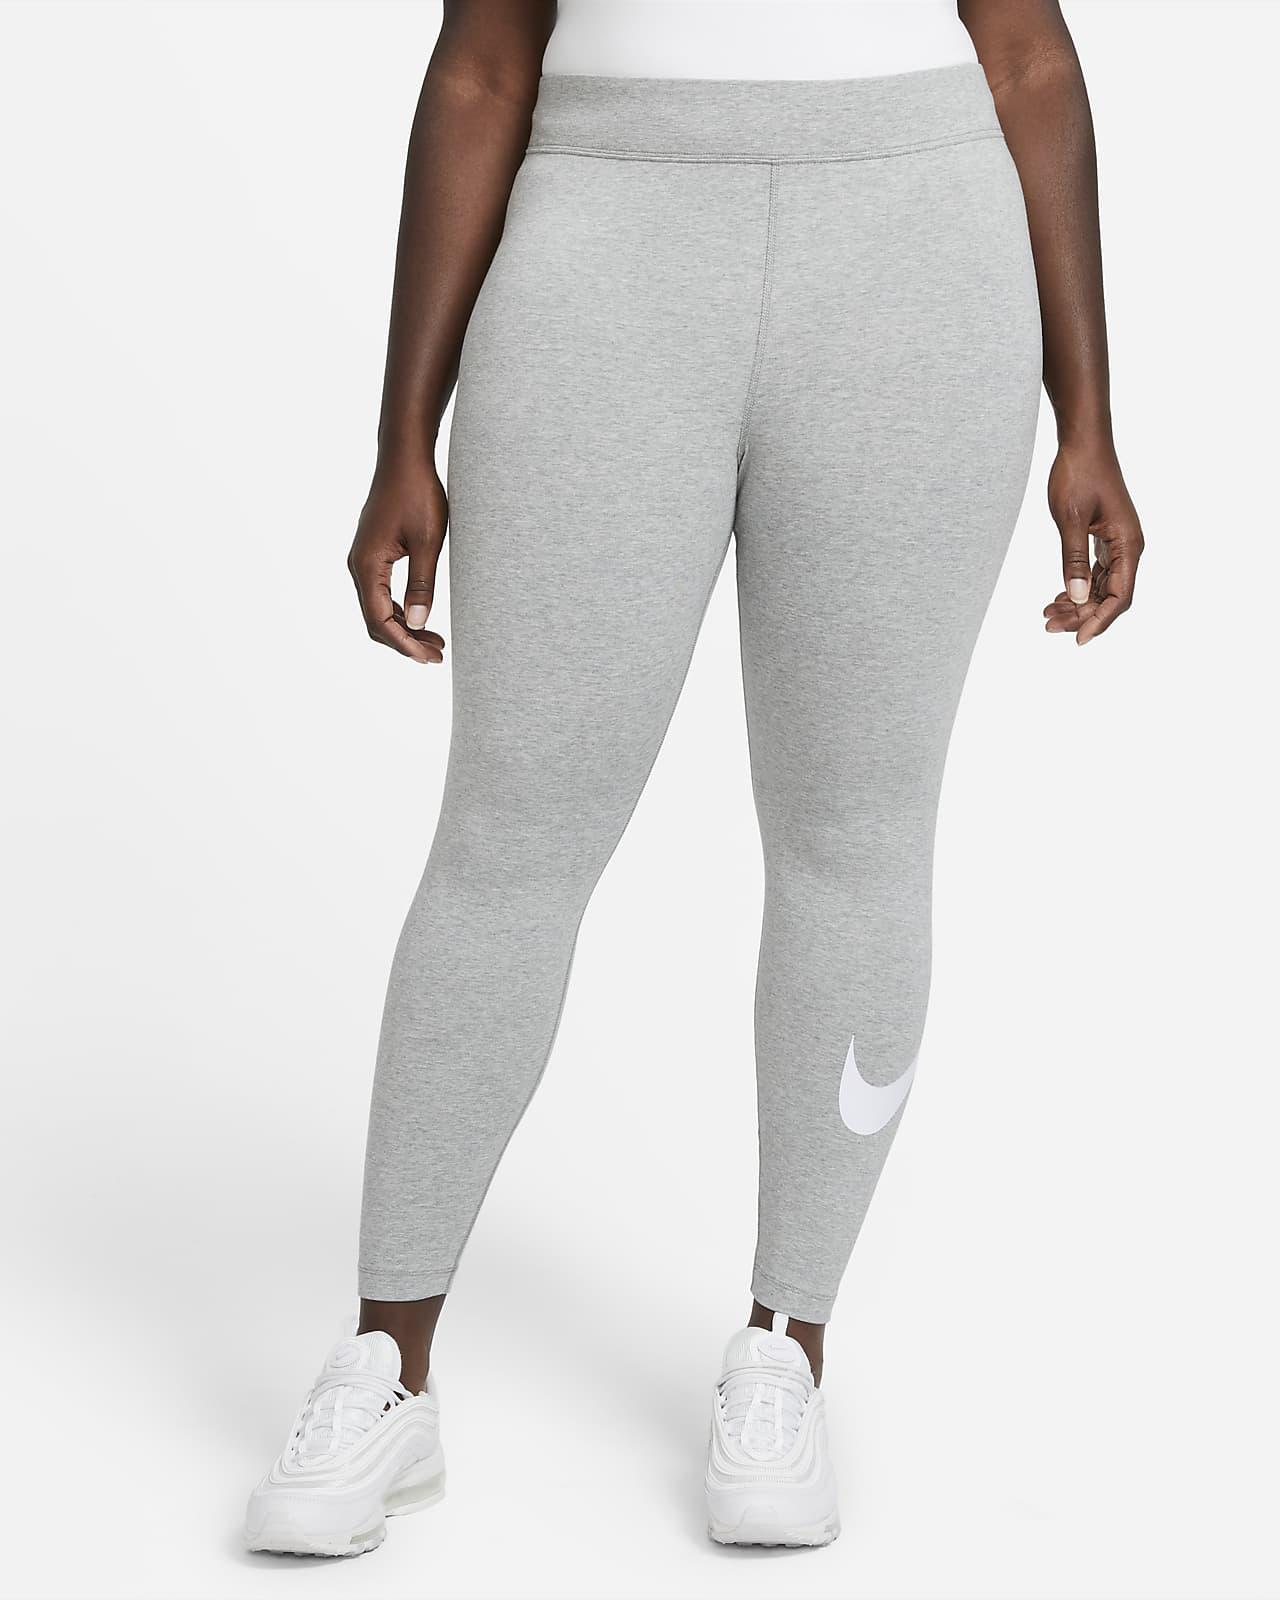 Legging Swoosh taille mi-haute Nike Sportswear Essential pour Femme (grande taille)